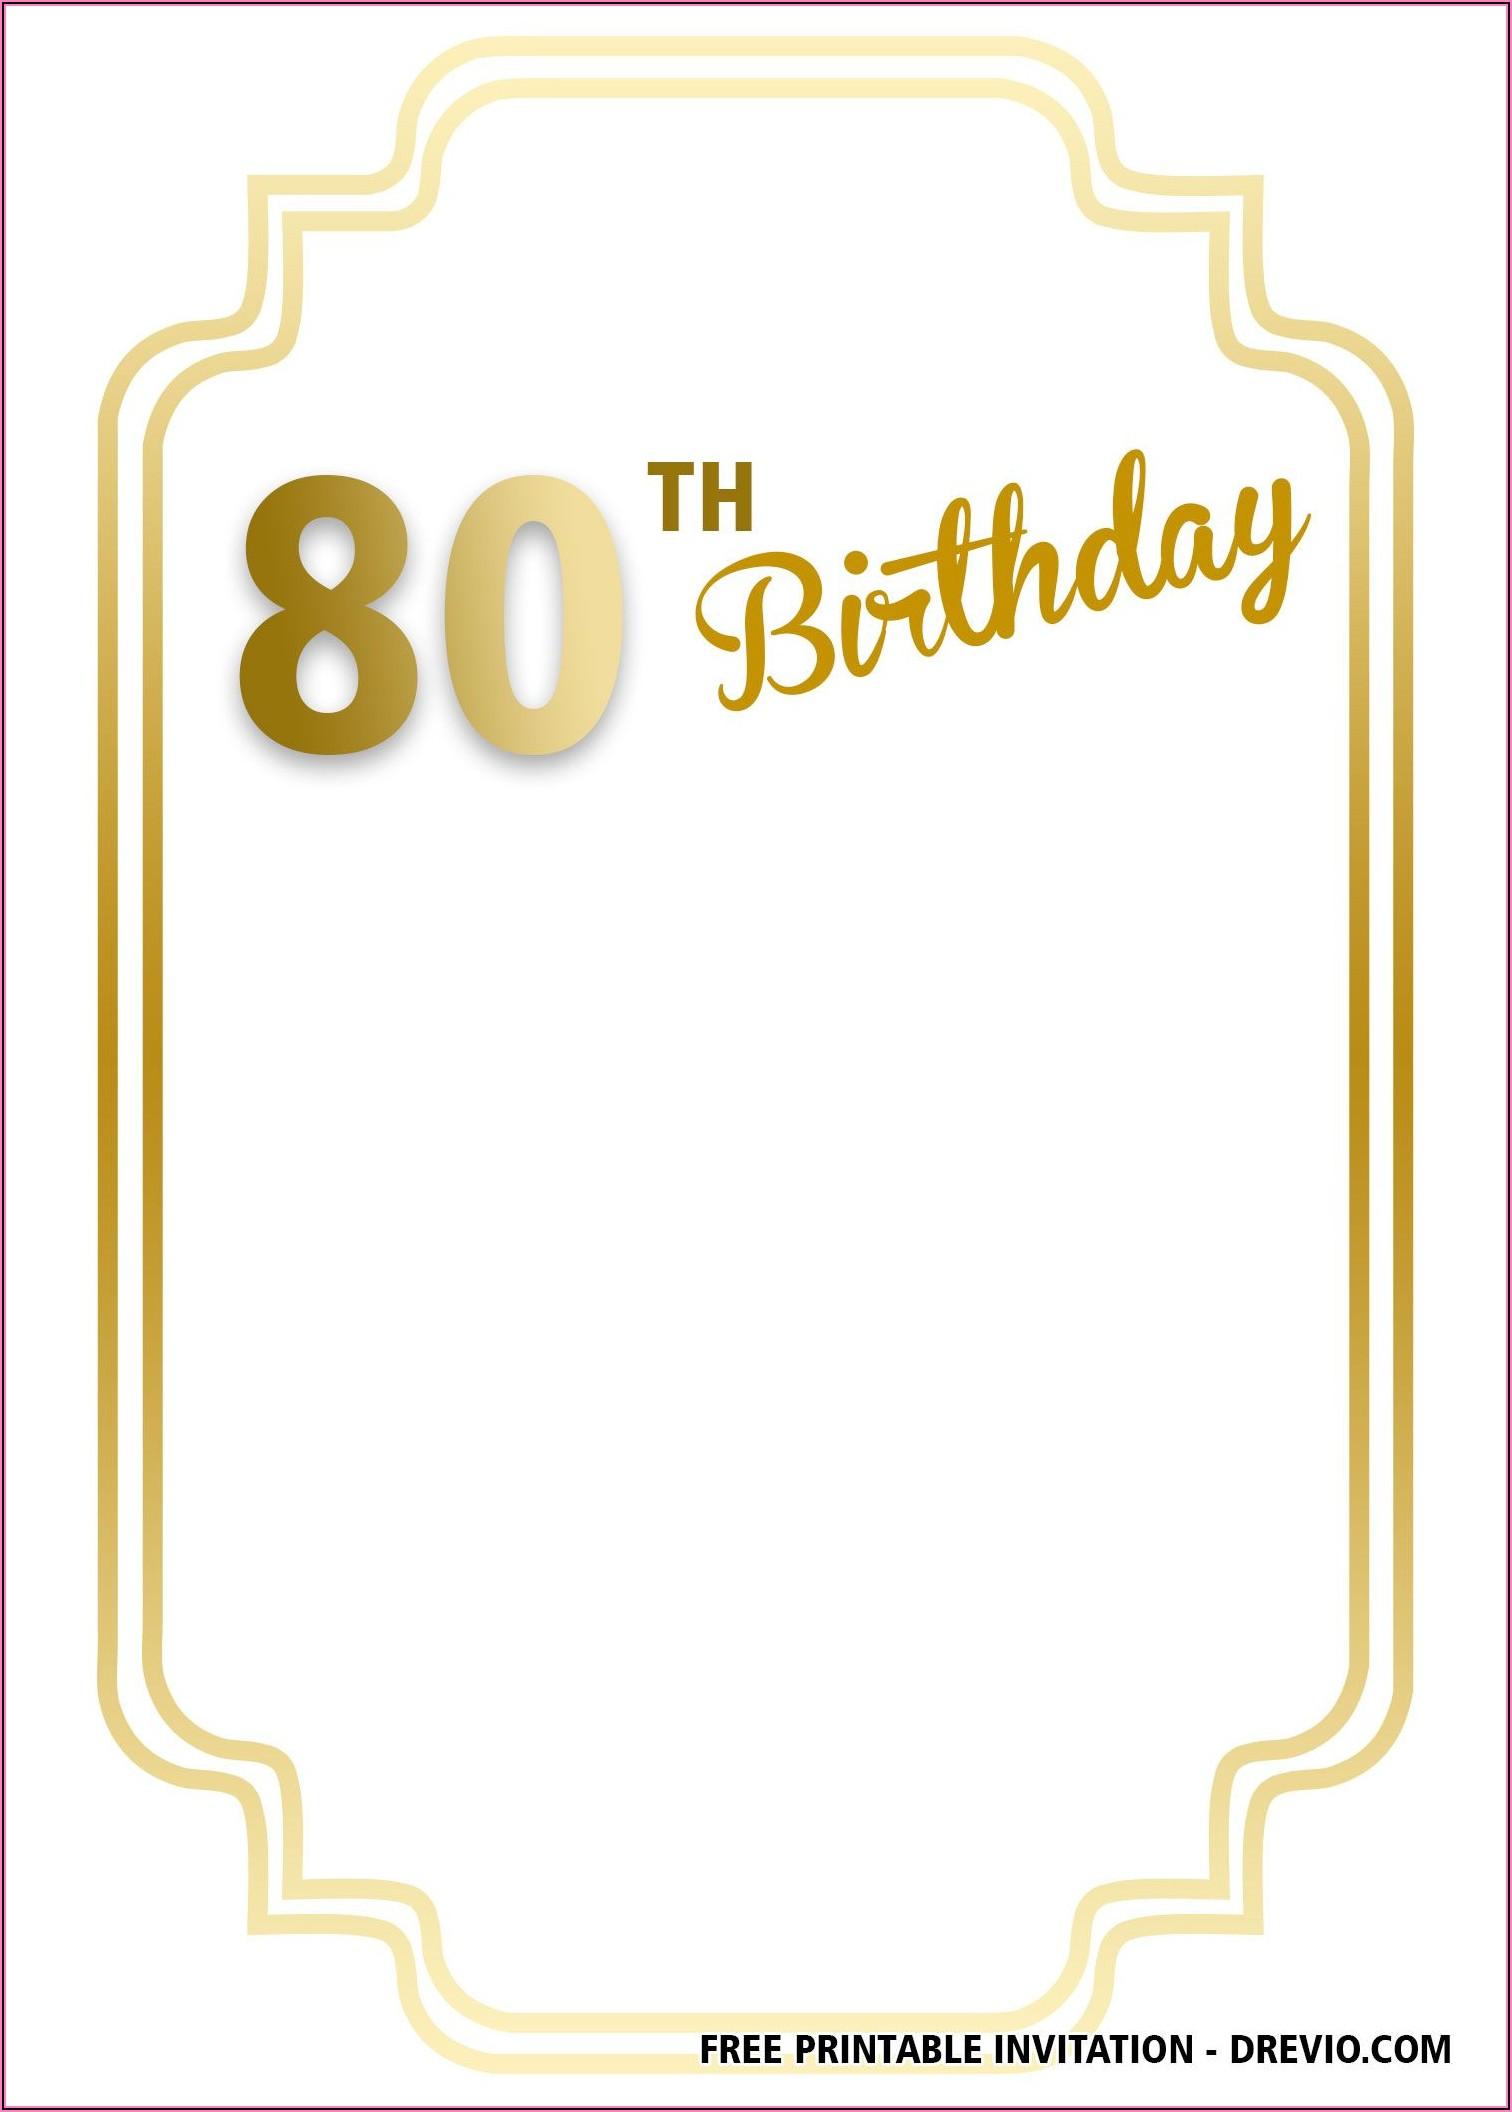 Birthday Invitation Templates Free Printable